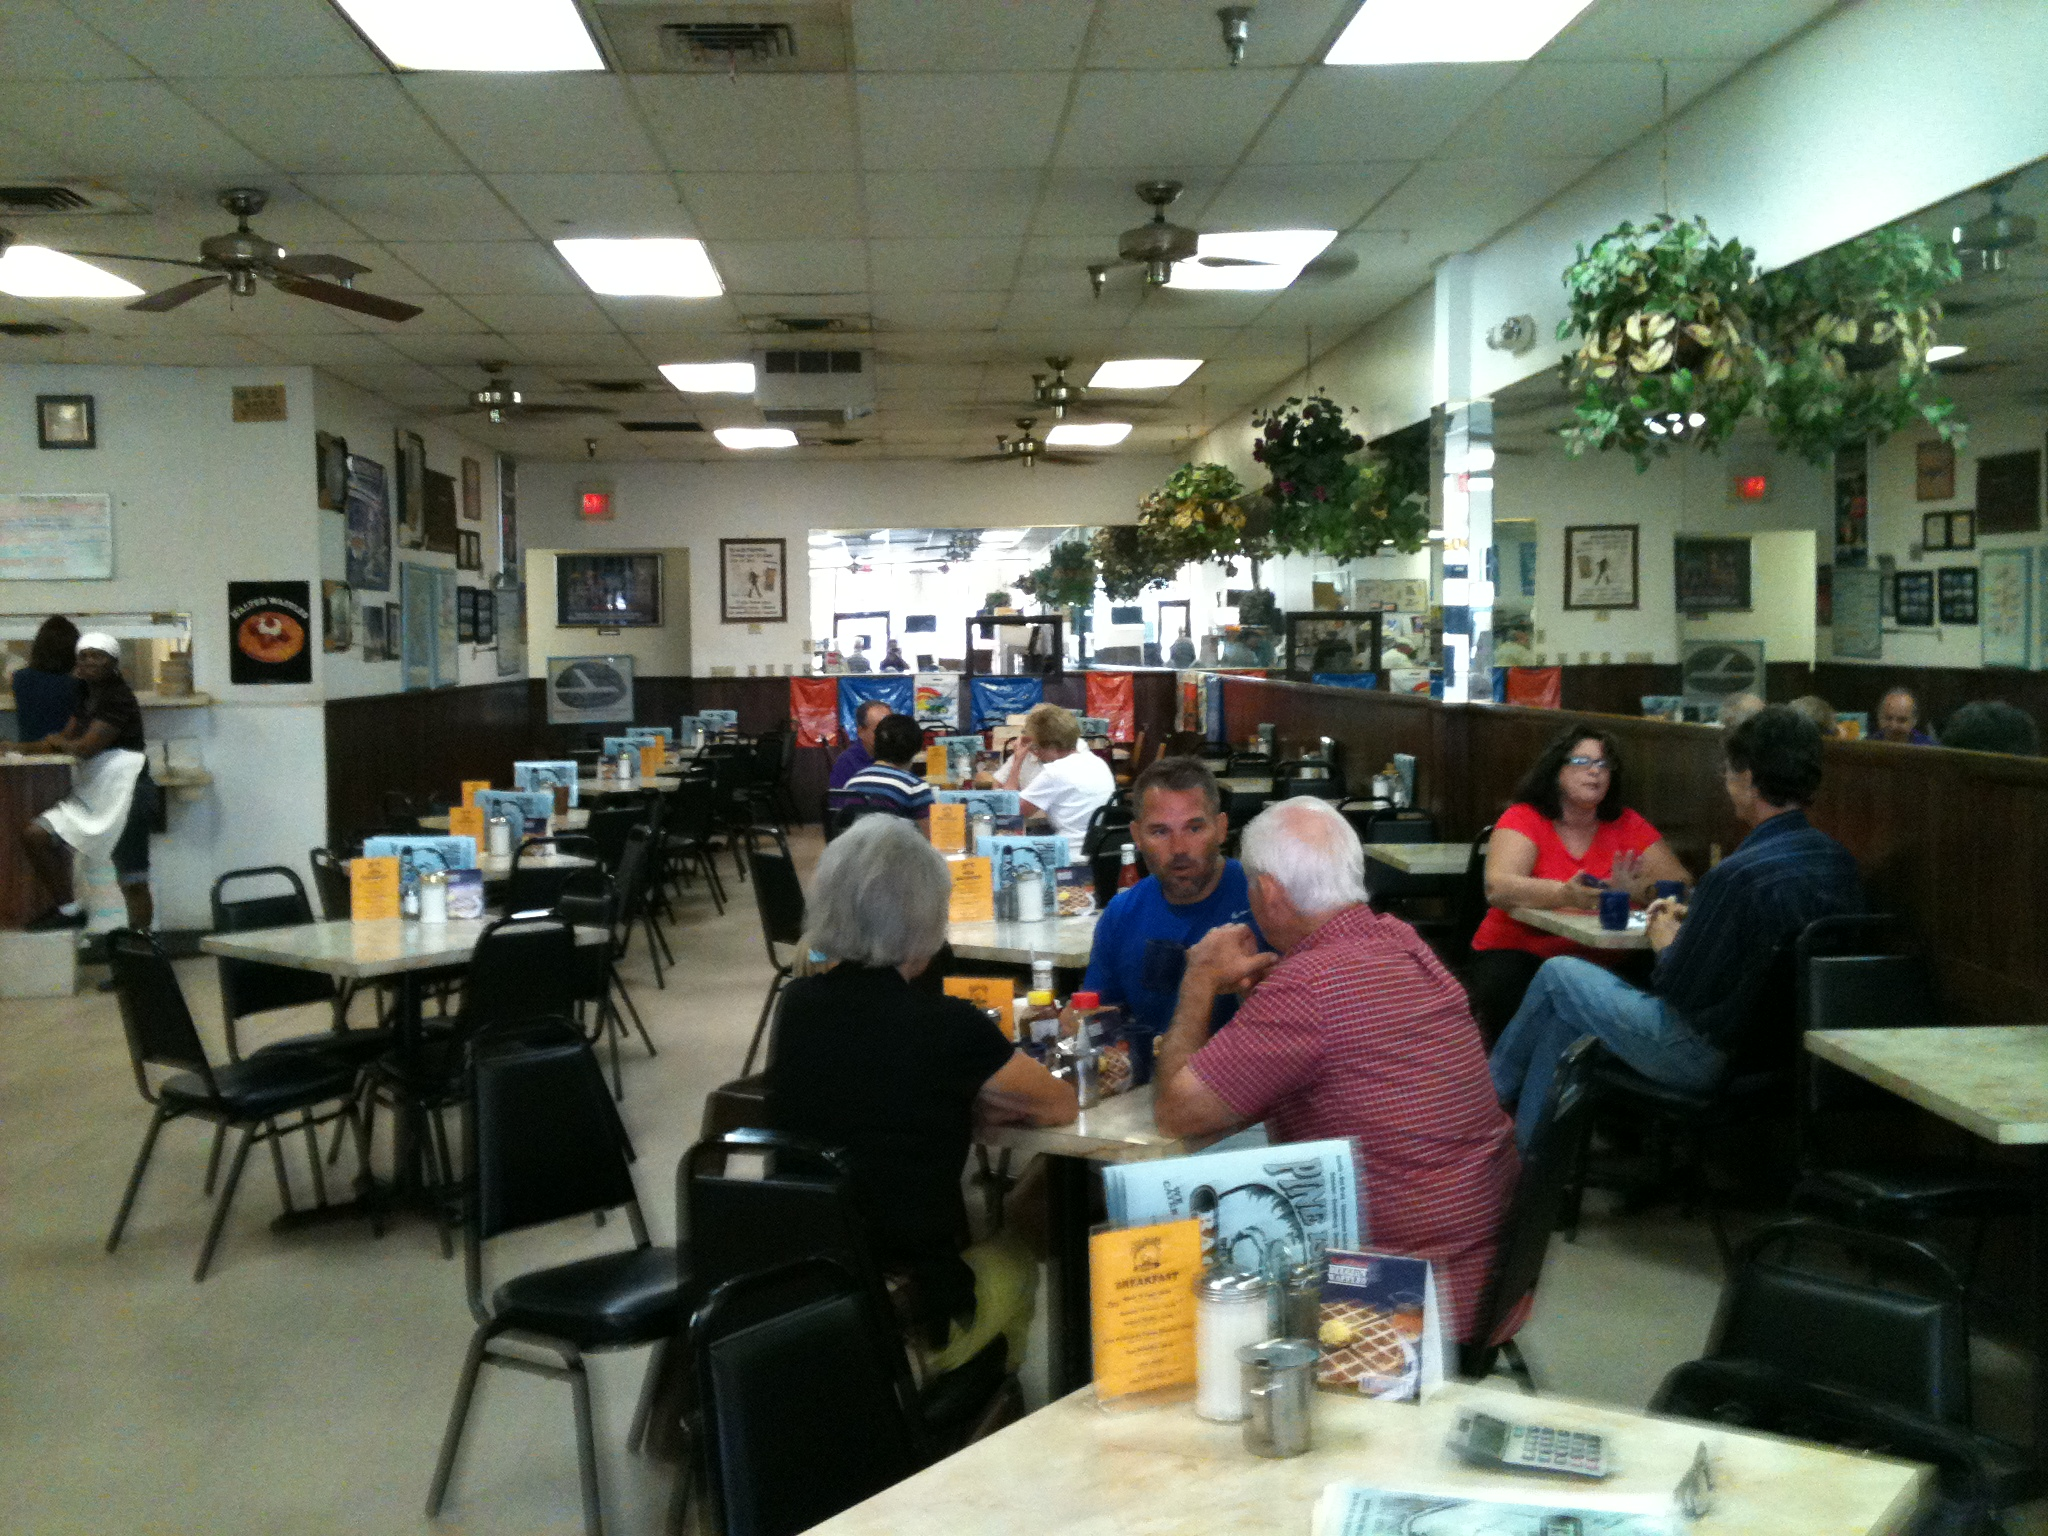 Profitable Bagel Shop for Sale in South Florida - Kosher Style Deli